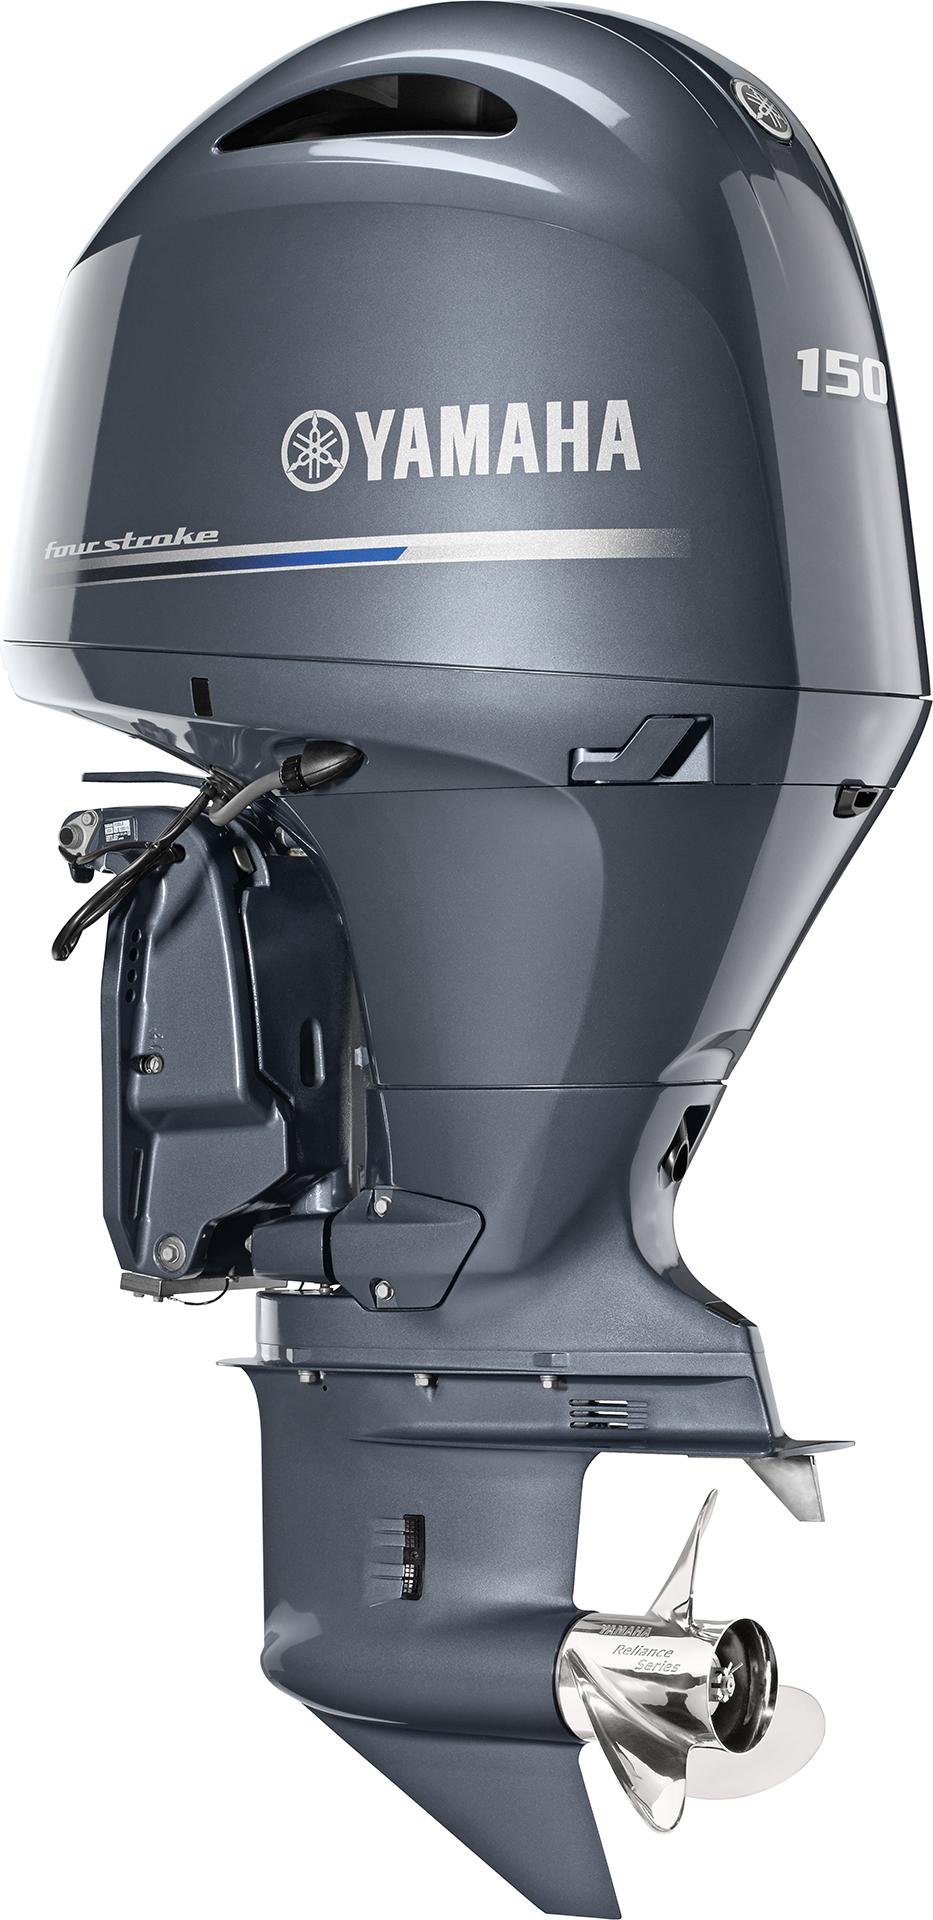 Yamaha F150XB In-Line 4 2.7L